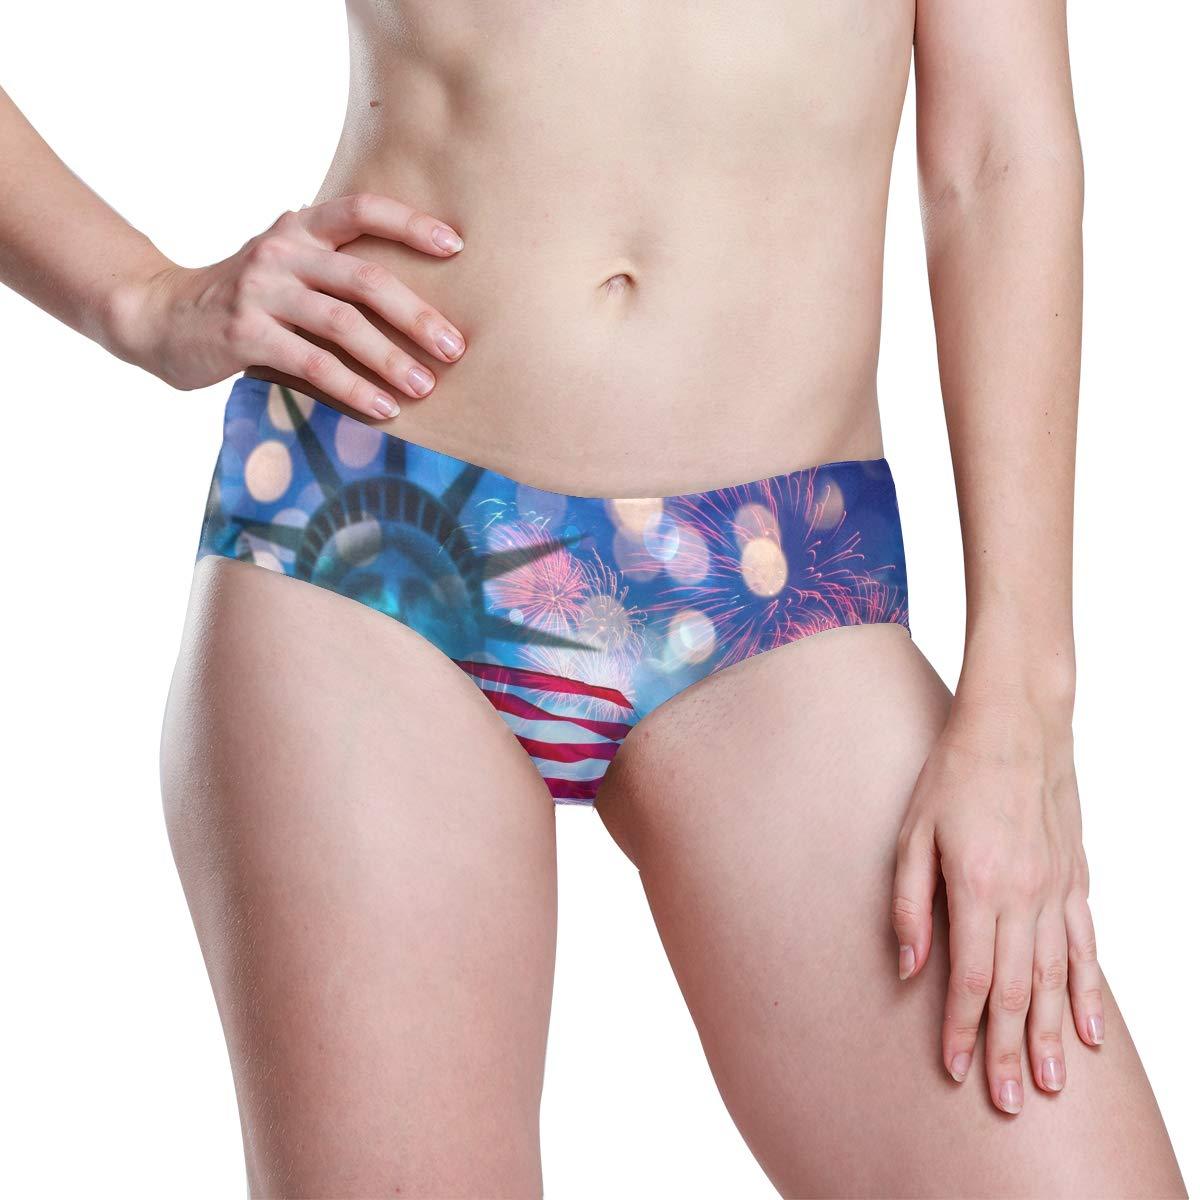 KGuanJi Seamless Independence Day America Flag Bikini Underwear Low Rise-2 Pack